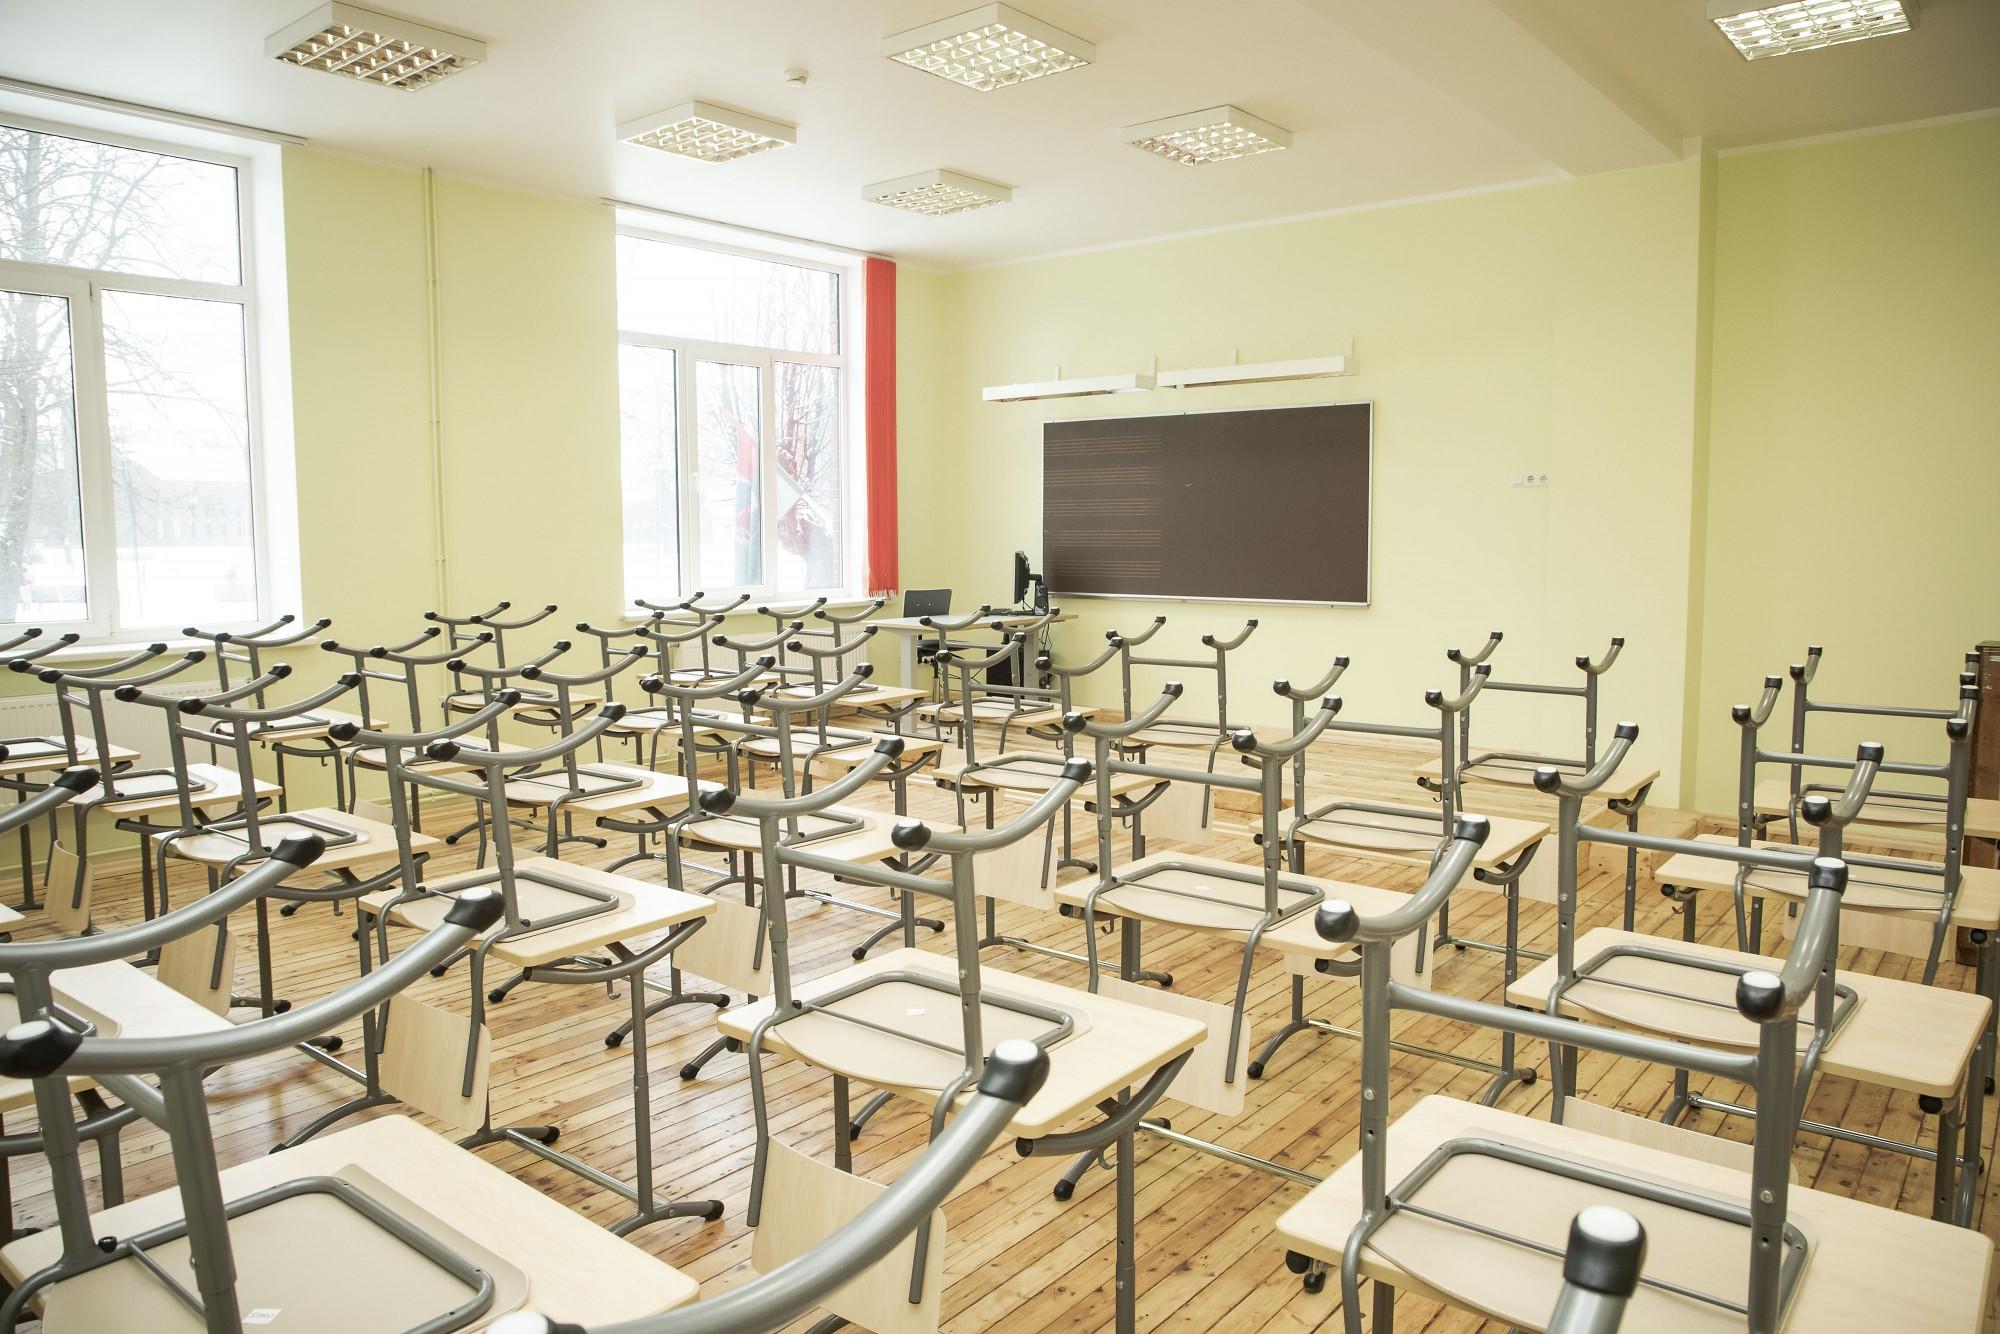 Pedagogu algas pieaugs aptuveni par 17 eiro